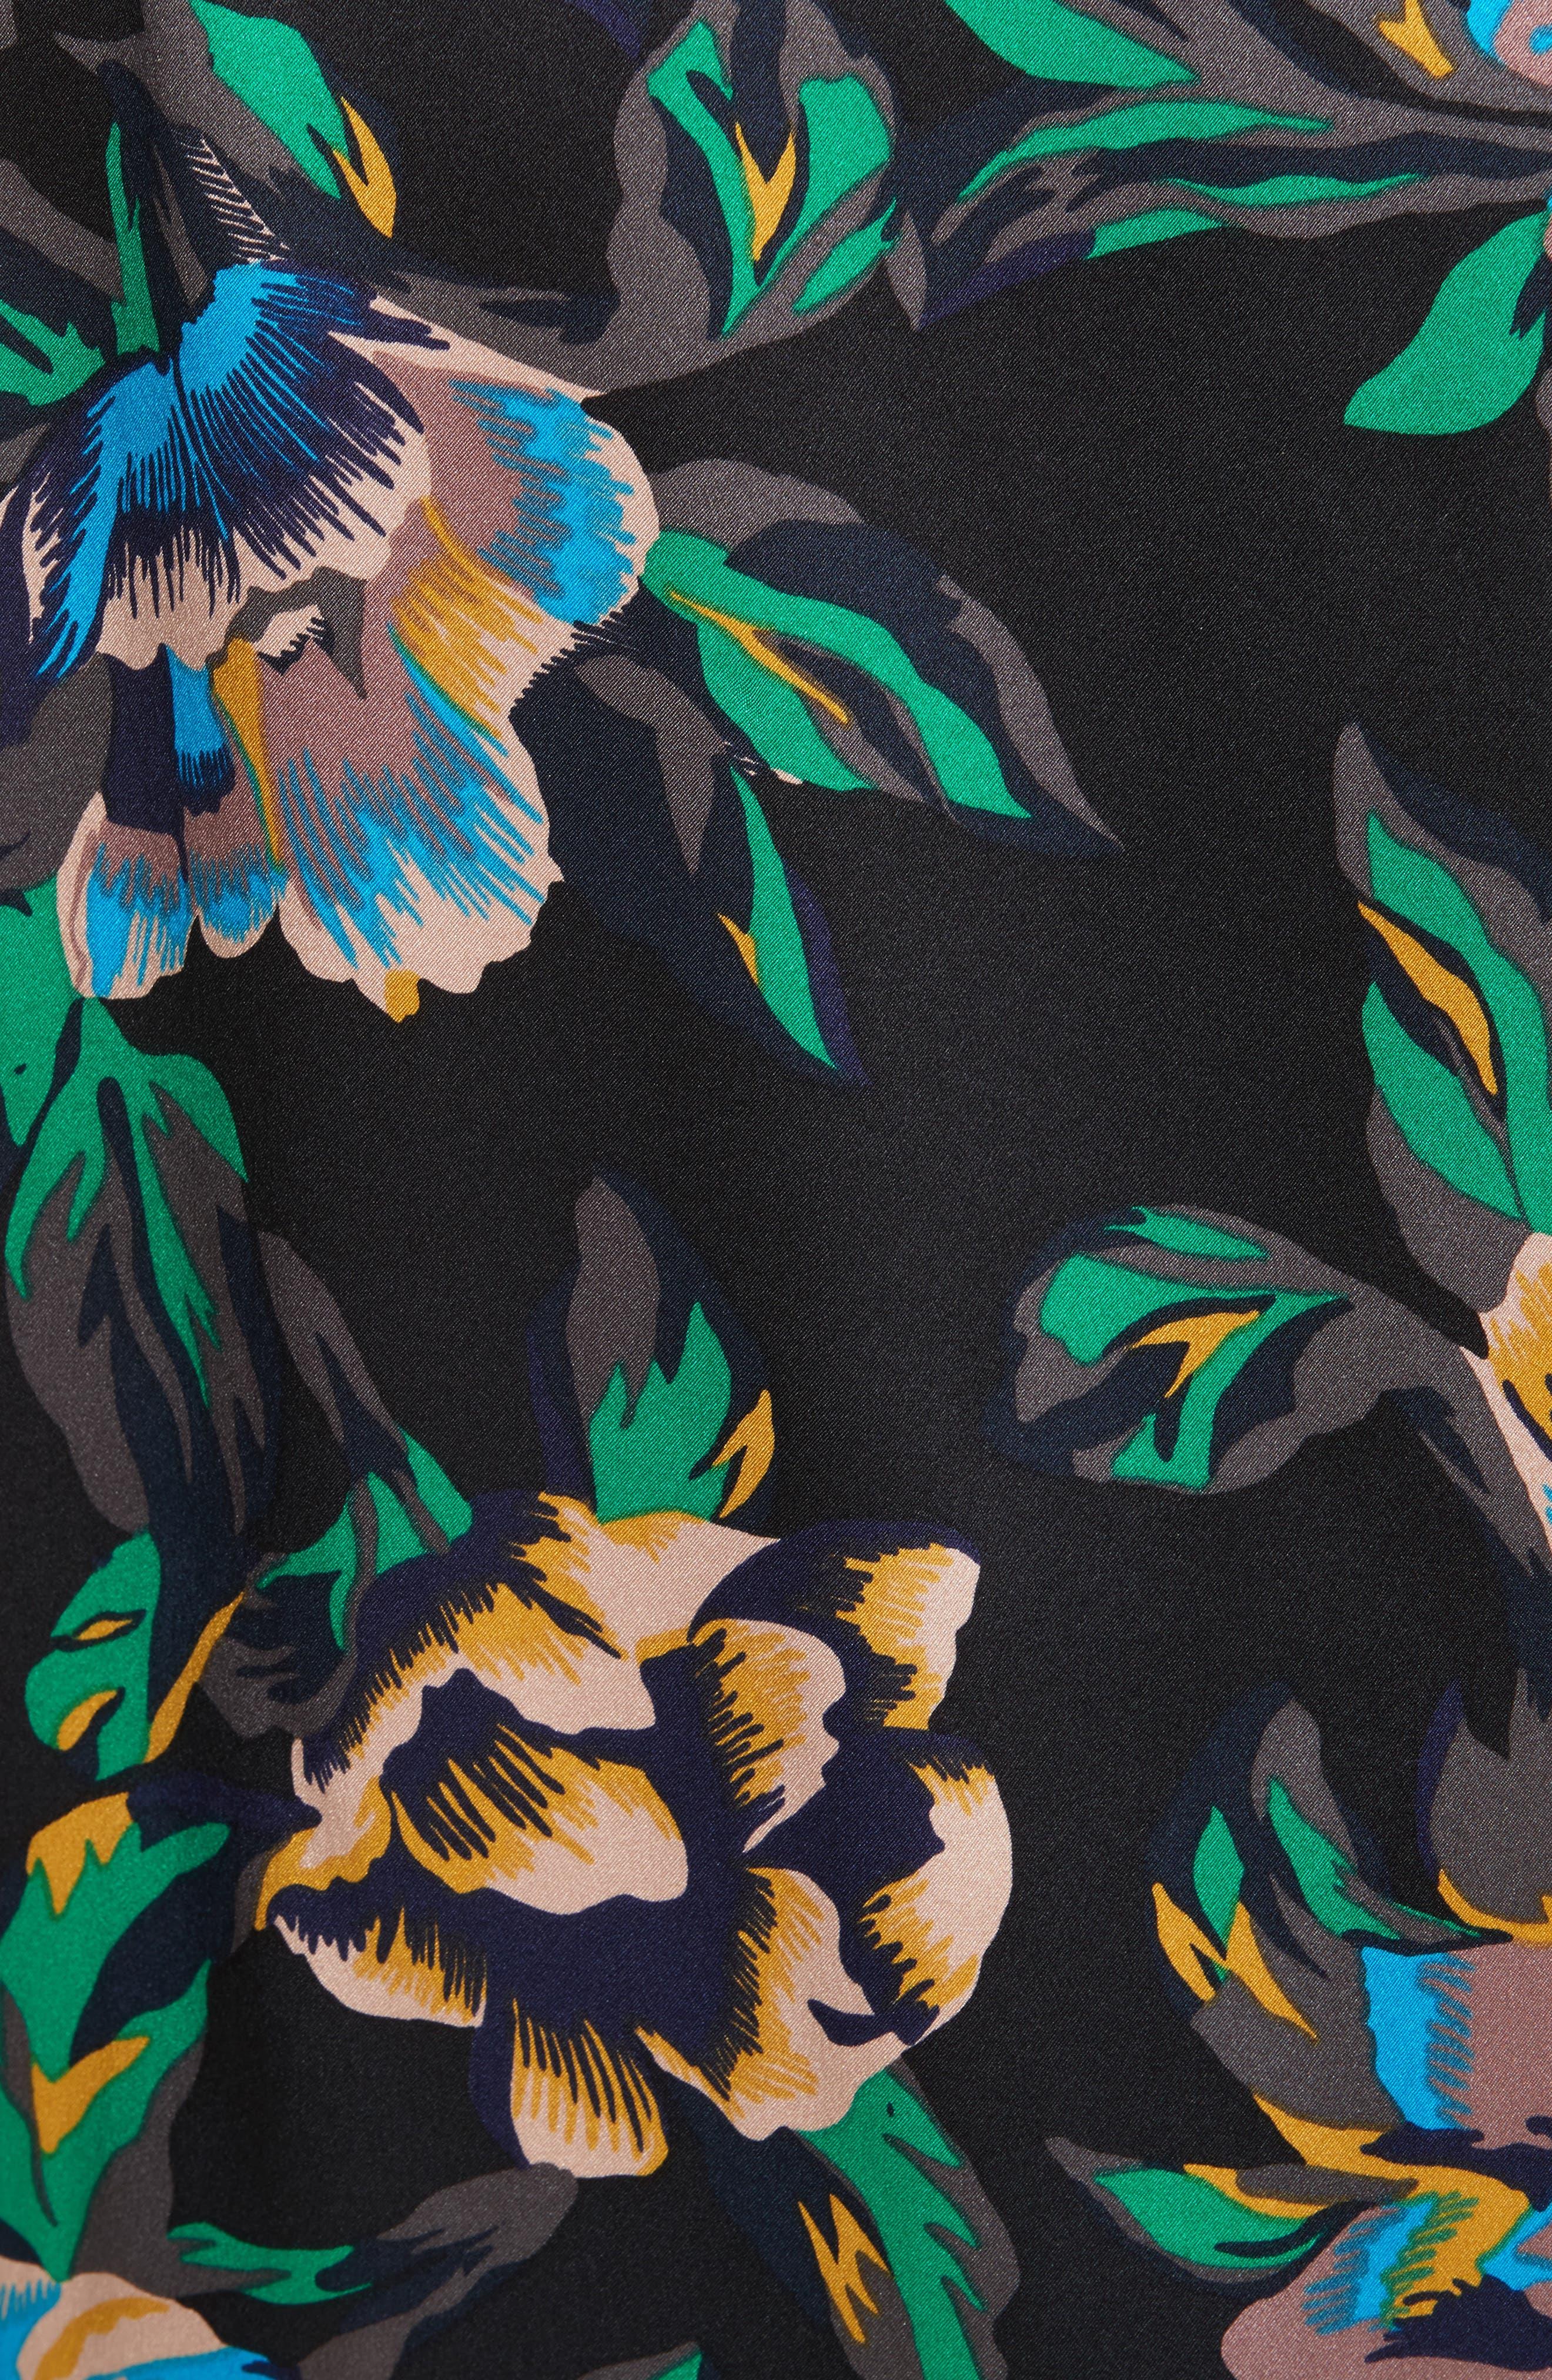 Mixed Media Crossover Silk Dress,                             Alternate thumbnail 5, color,                             442